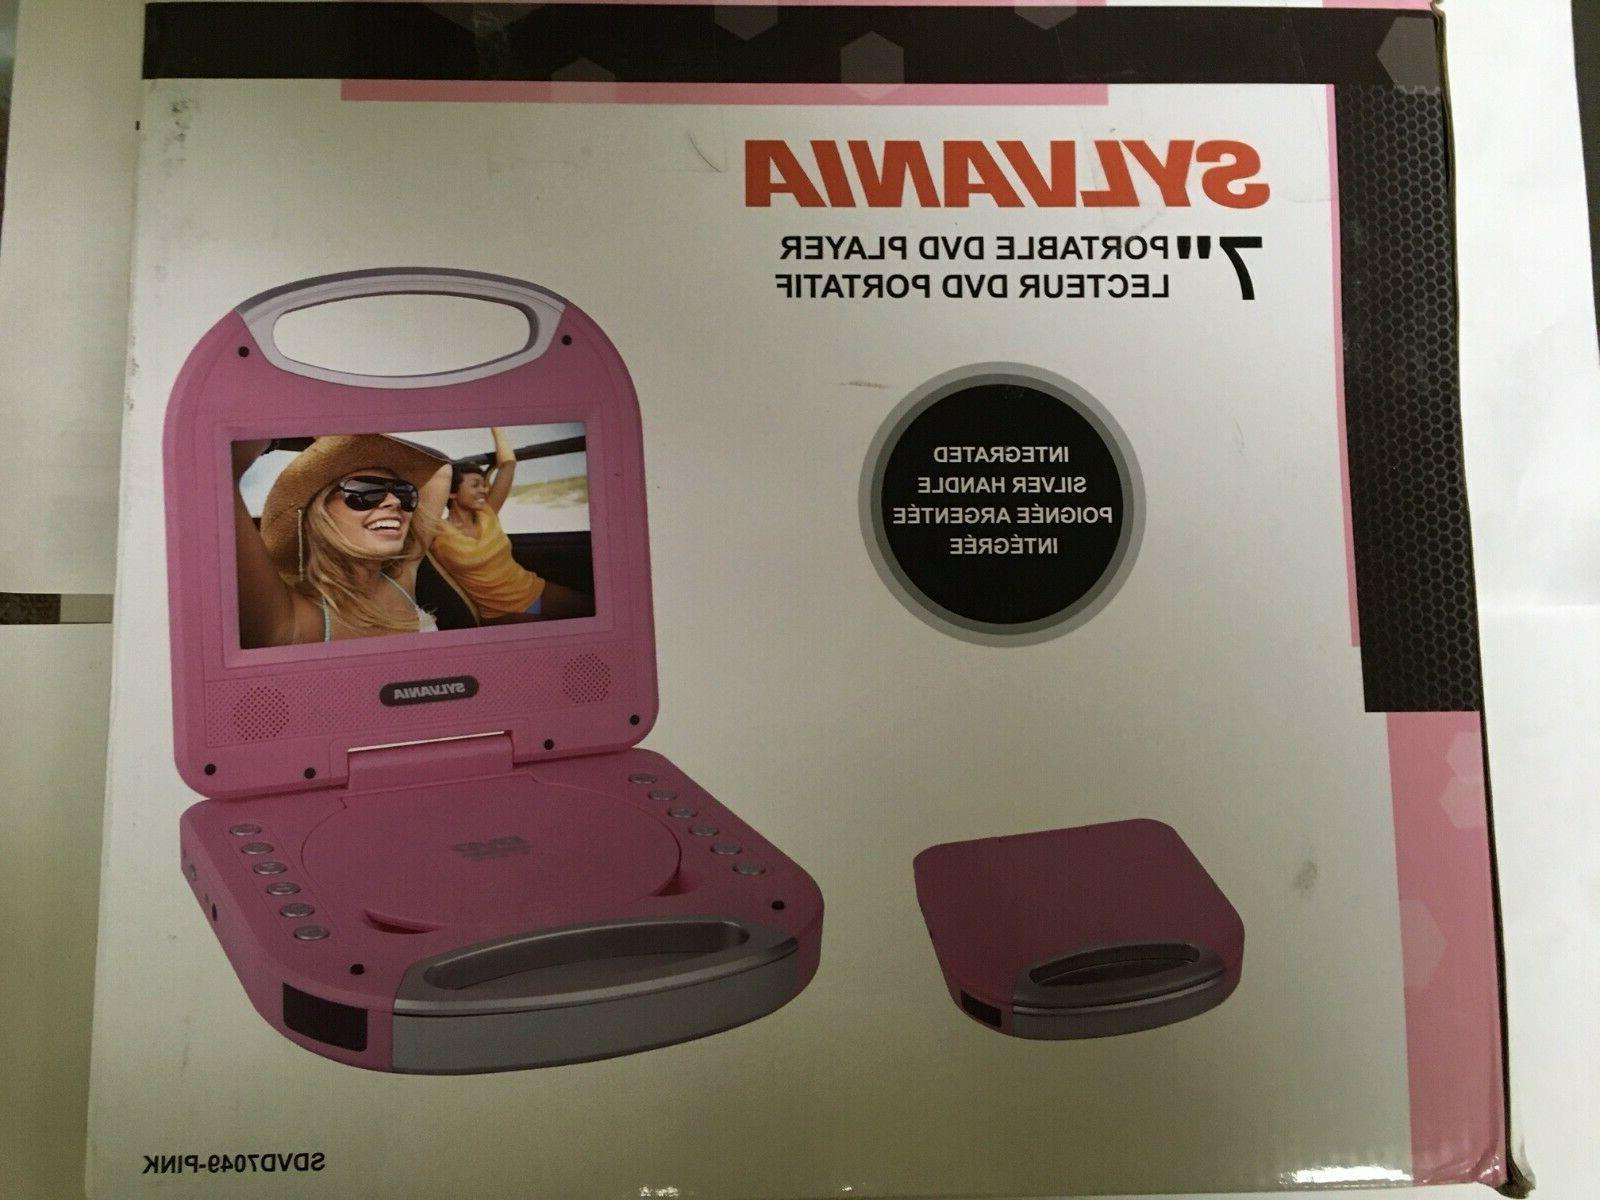 Sylvania Portable Media Player models,